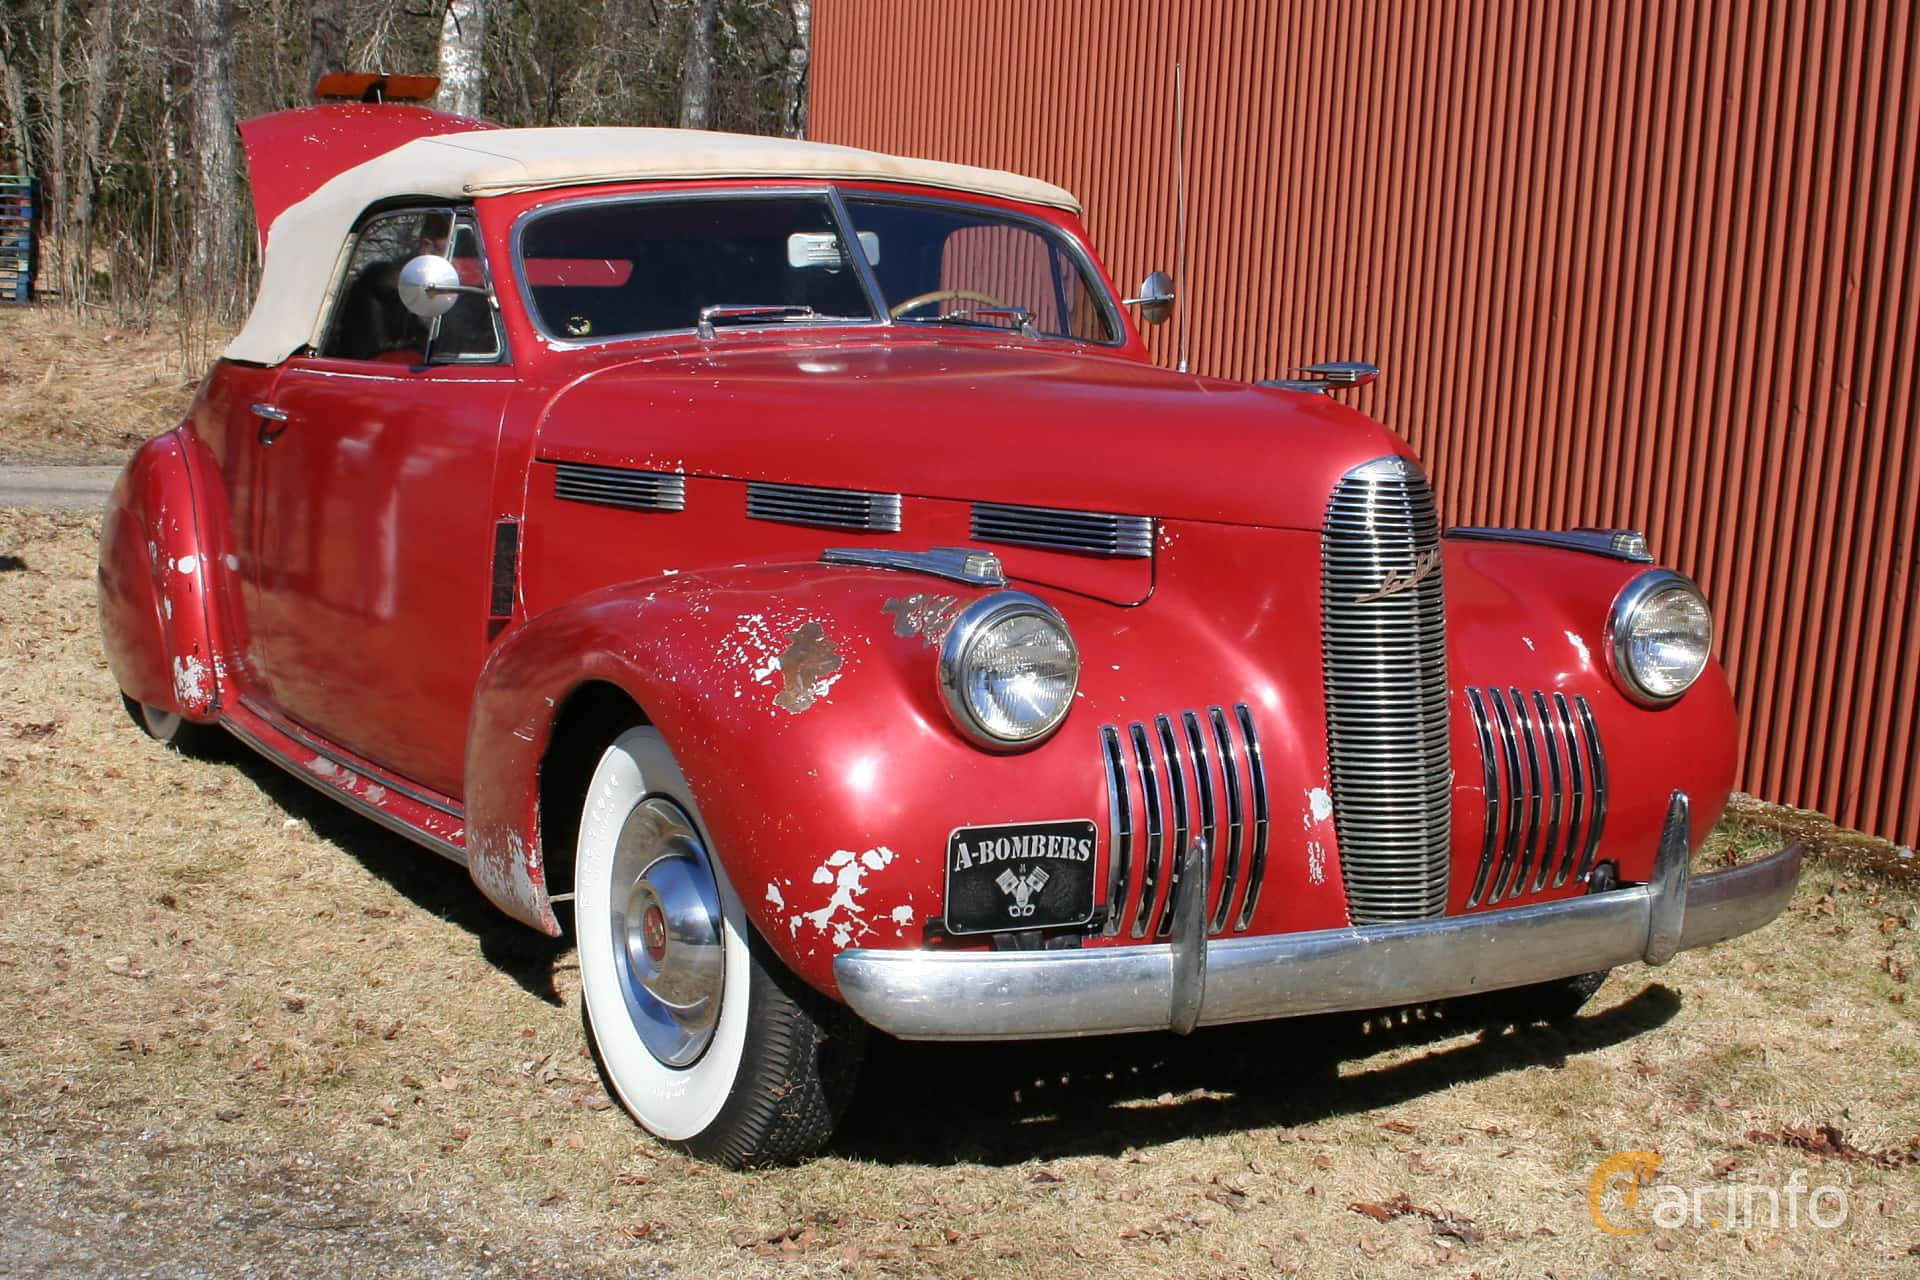 Cadillac LaSalle Convertible Coupe 5.3 Manual, 130hp, 1940